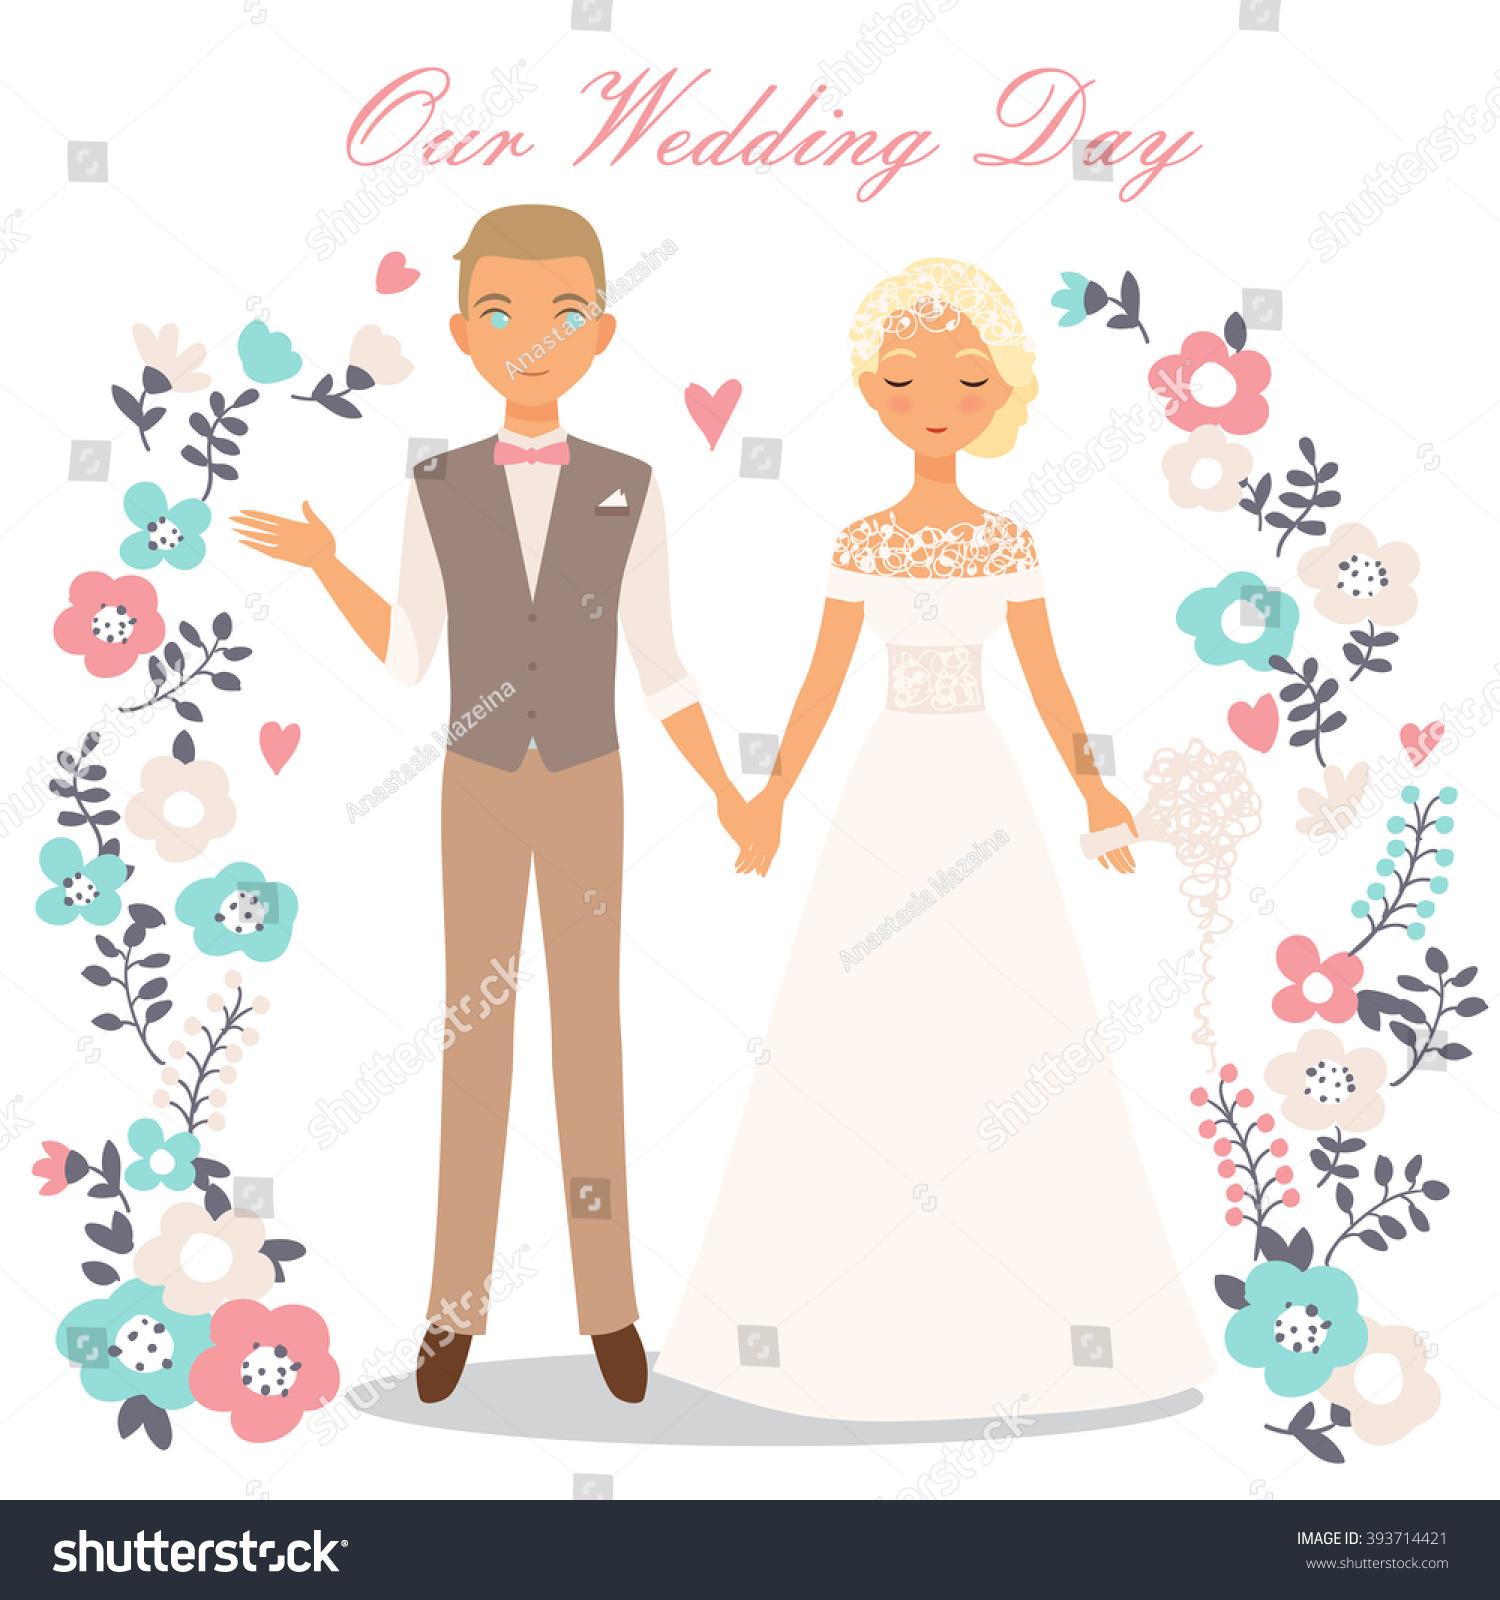 Cute Wedding Couple Vector Illustration Stock Vector ...